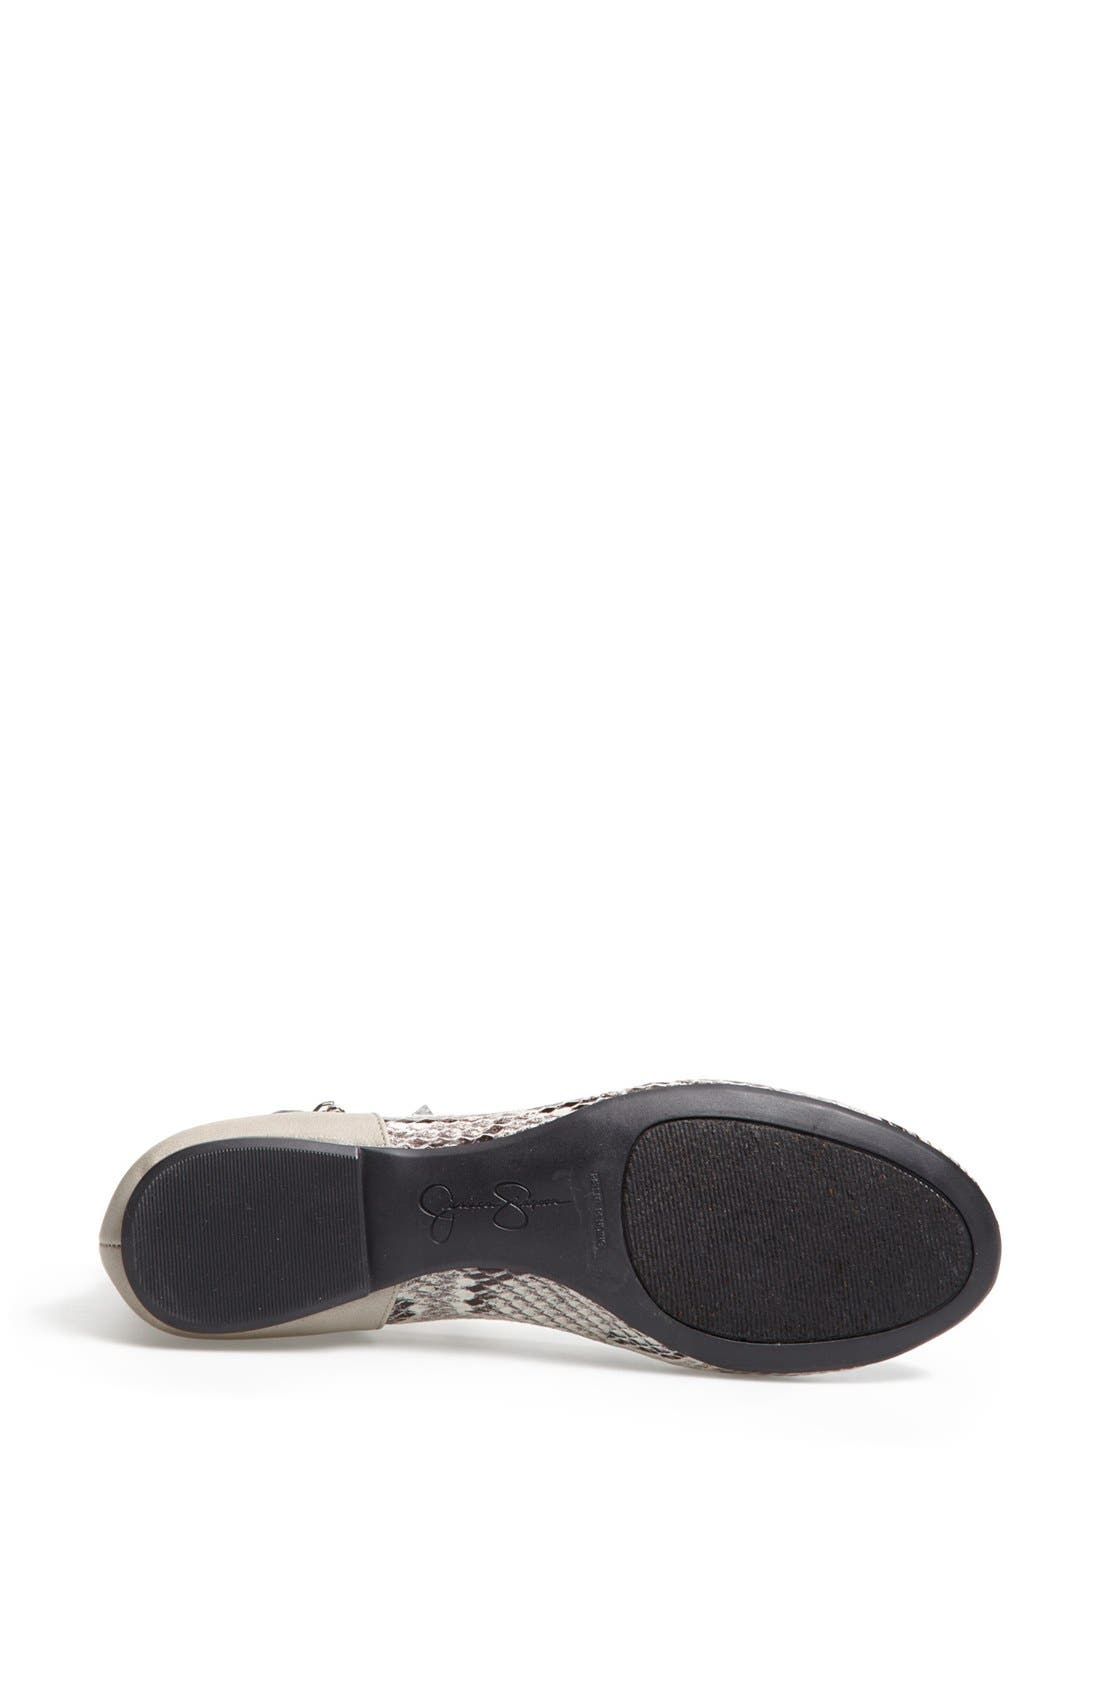 Alternate Image 4  - Jessica Simpson 'Munney' Studded Ankle Strap Flat